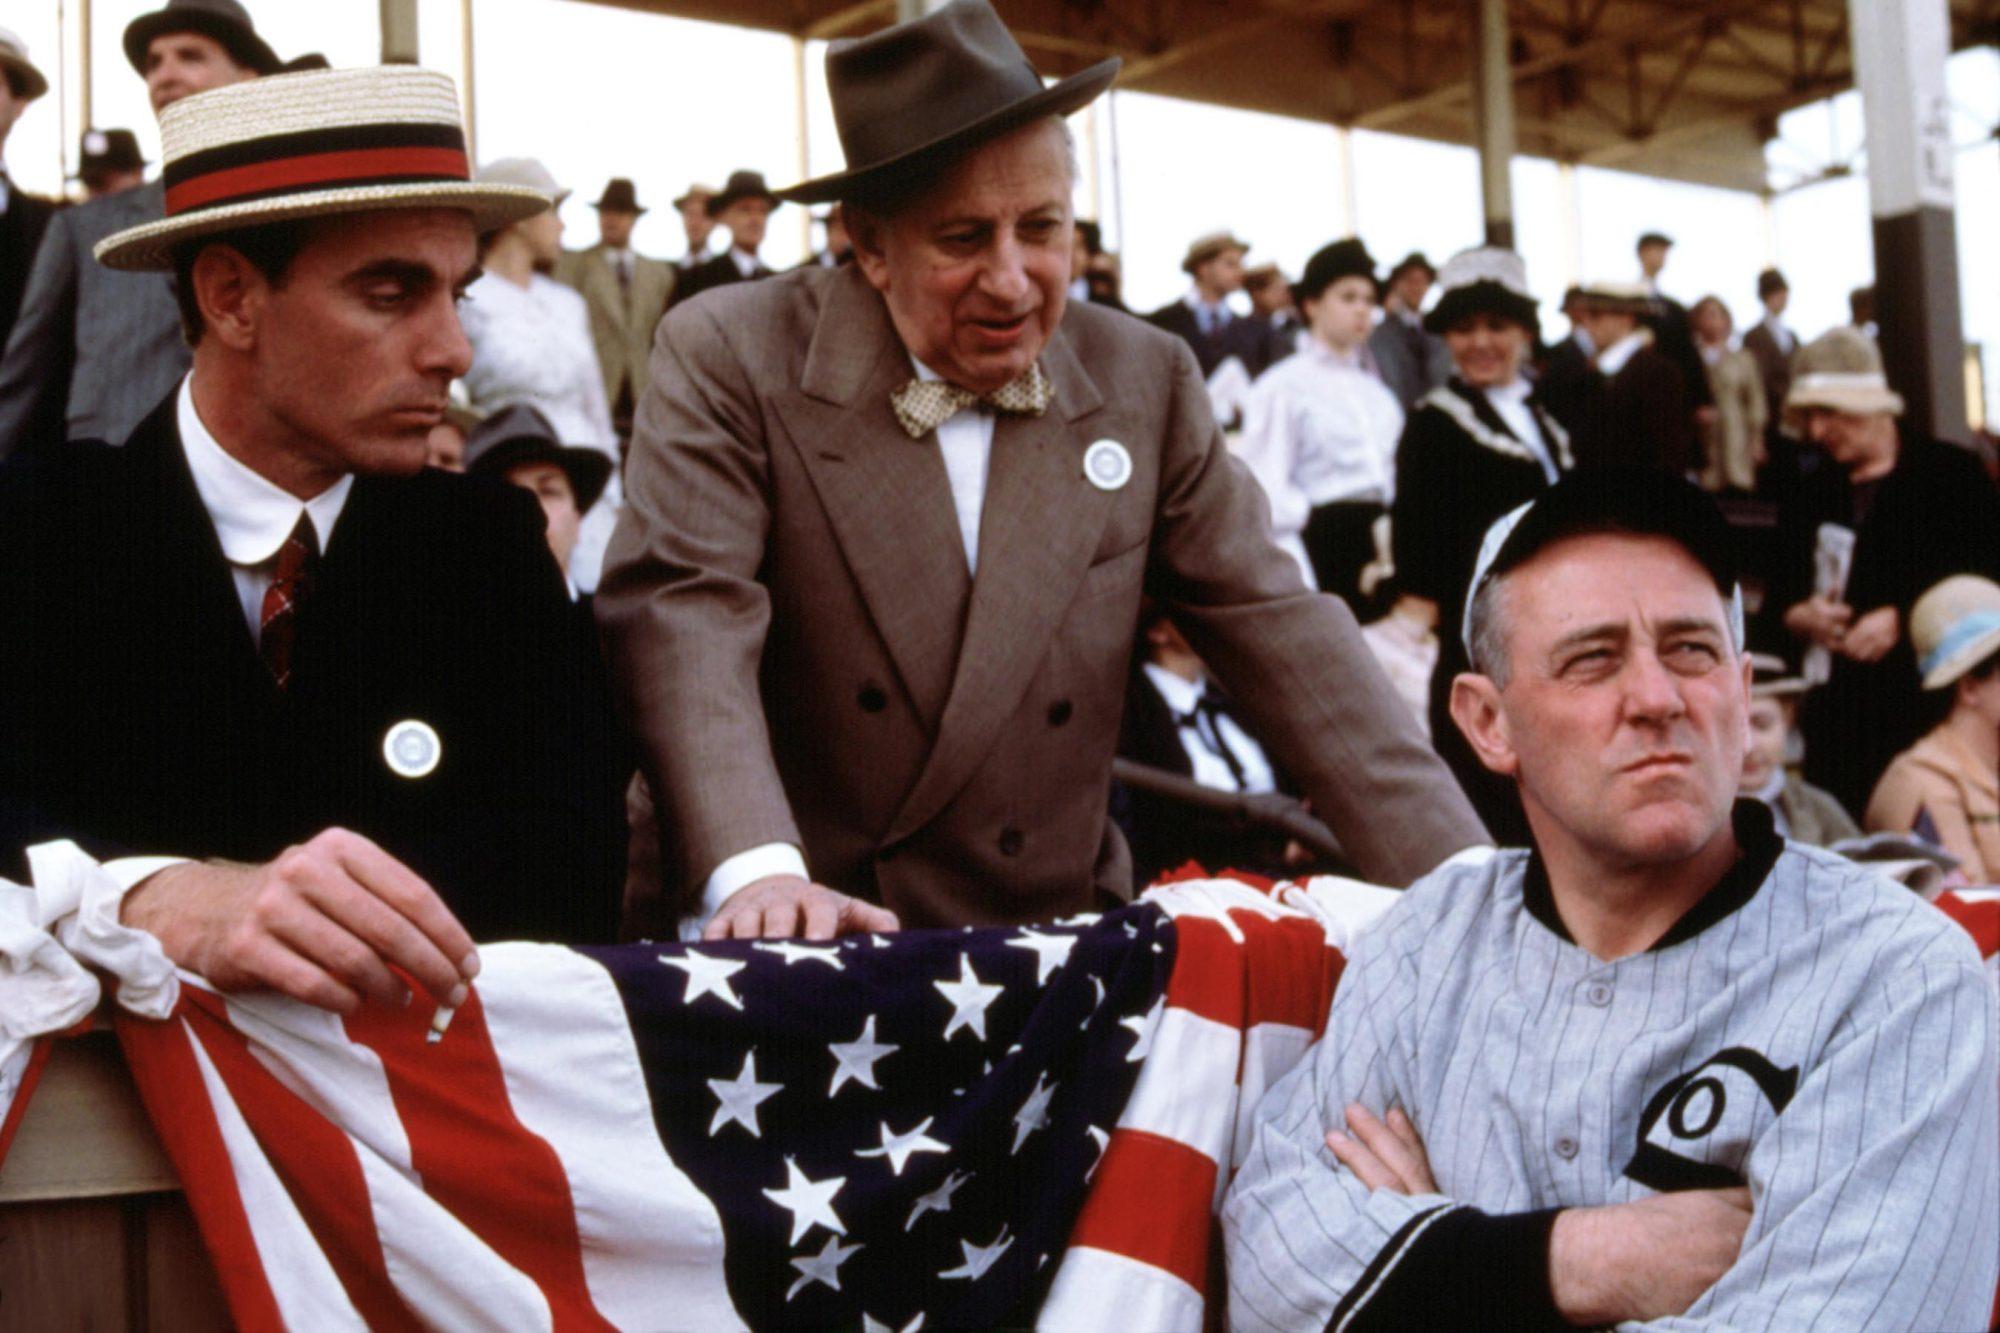 EIGHT MEN OUT, John Sayles, Studs Terkel, John Mahoney, 1988